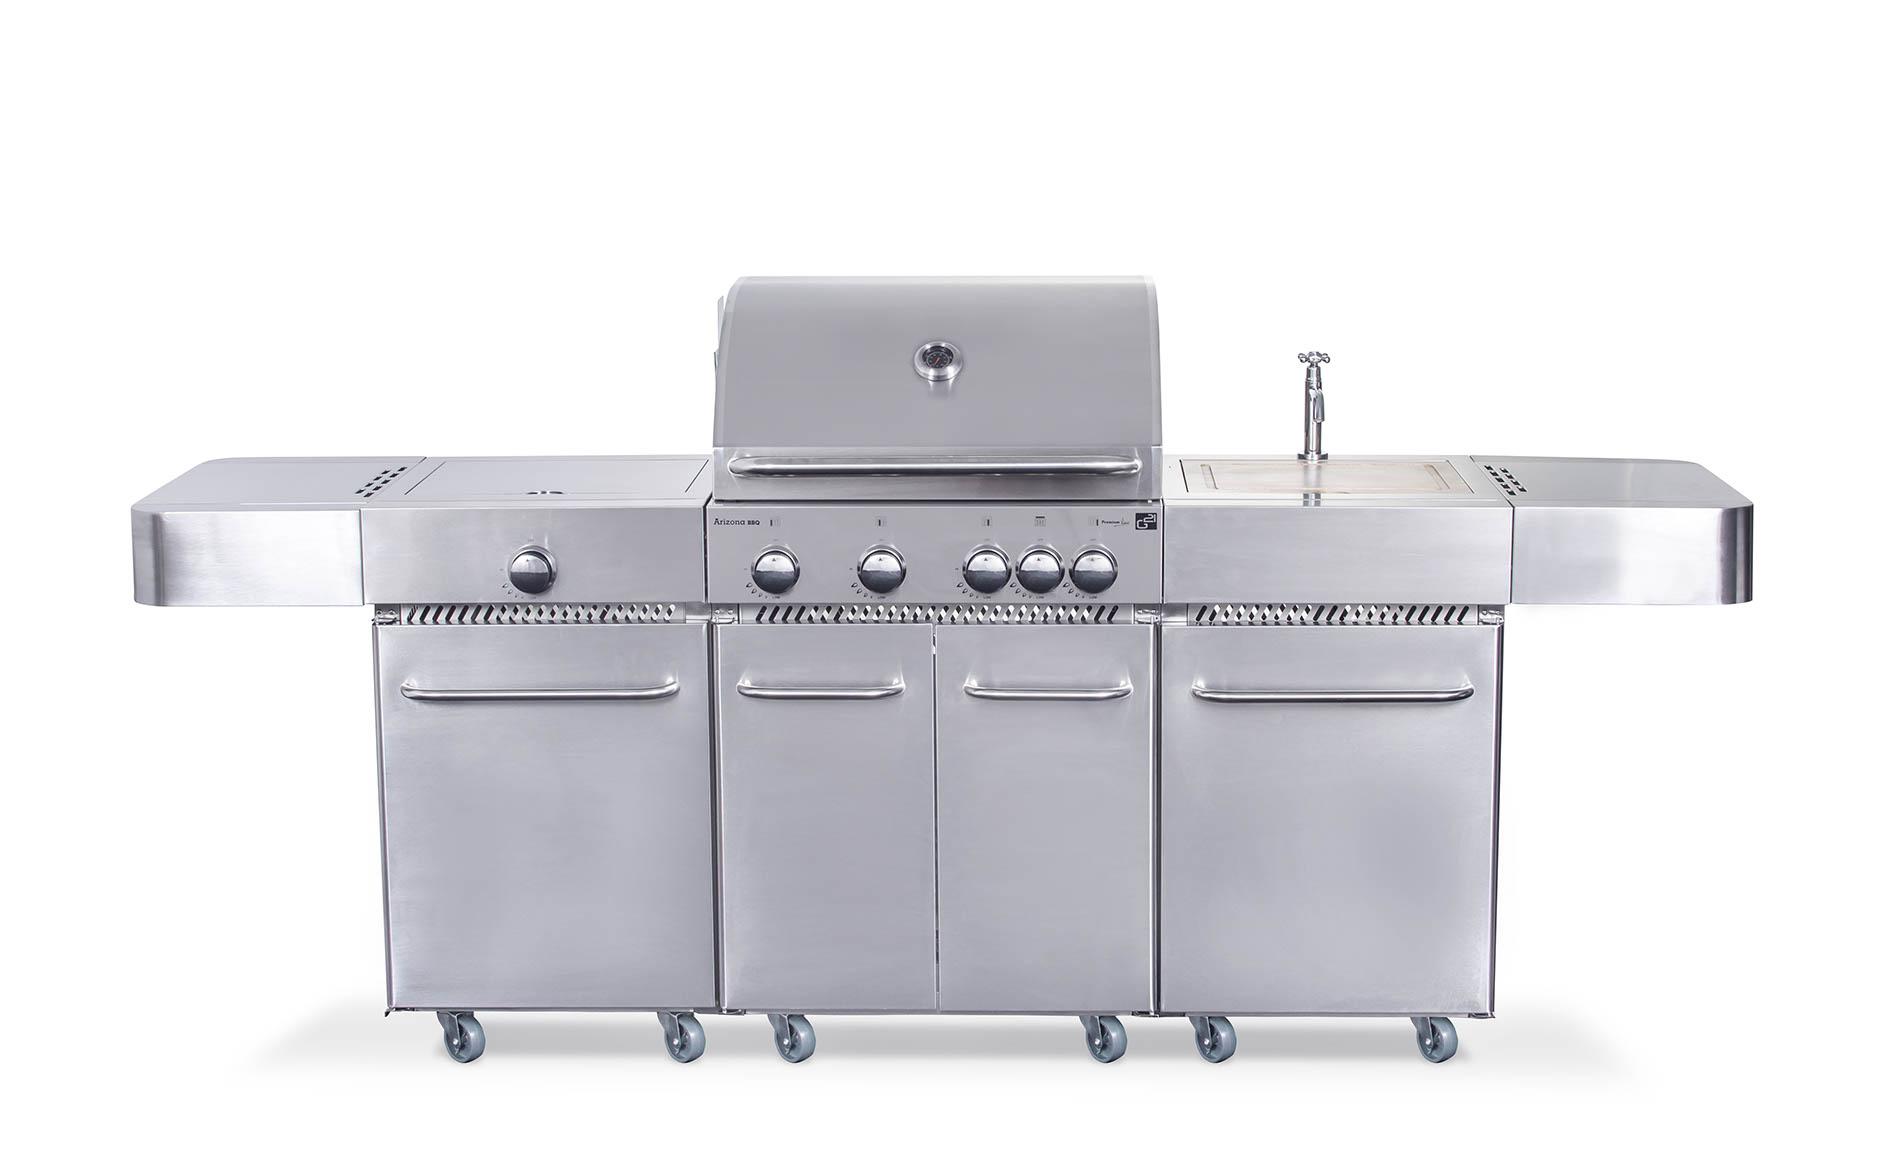 Plynový gril G21 Arizona, BBQ kuchyně Premium Line 6 hořáků + zdarma redukční ventil; GA-BBQARZ